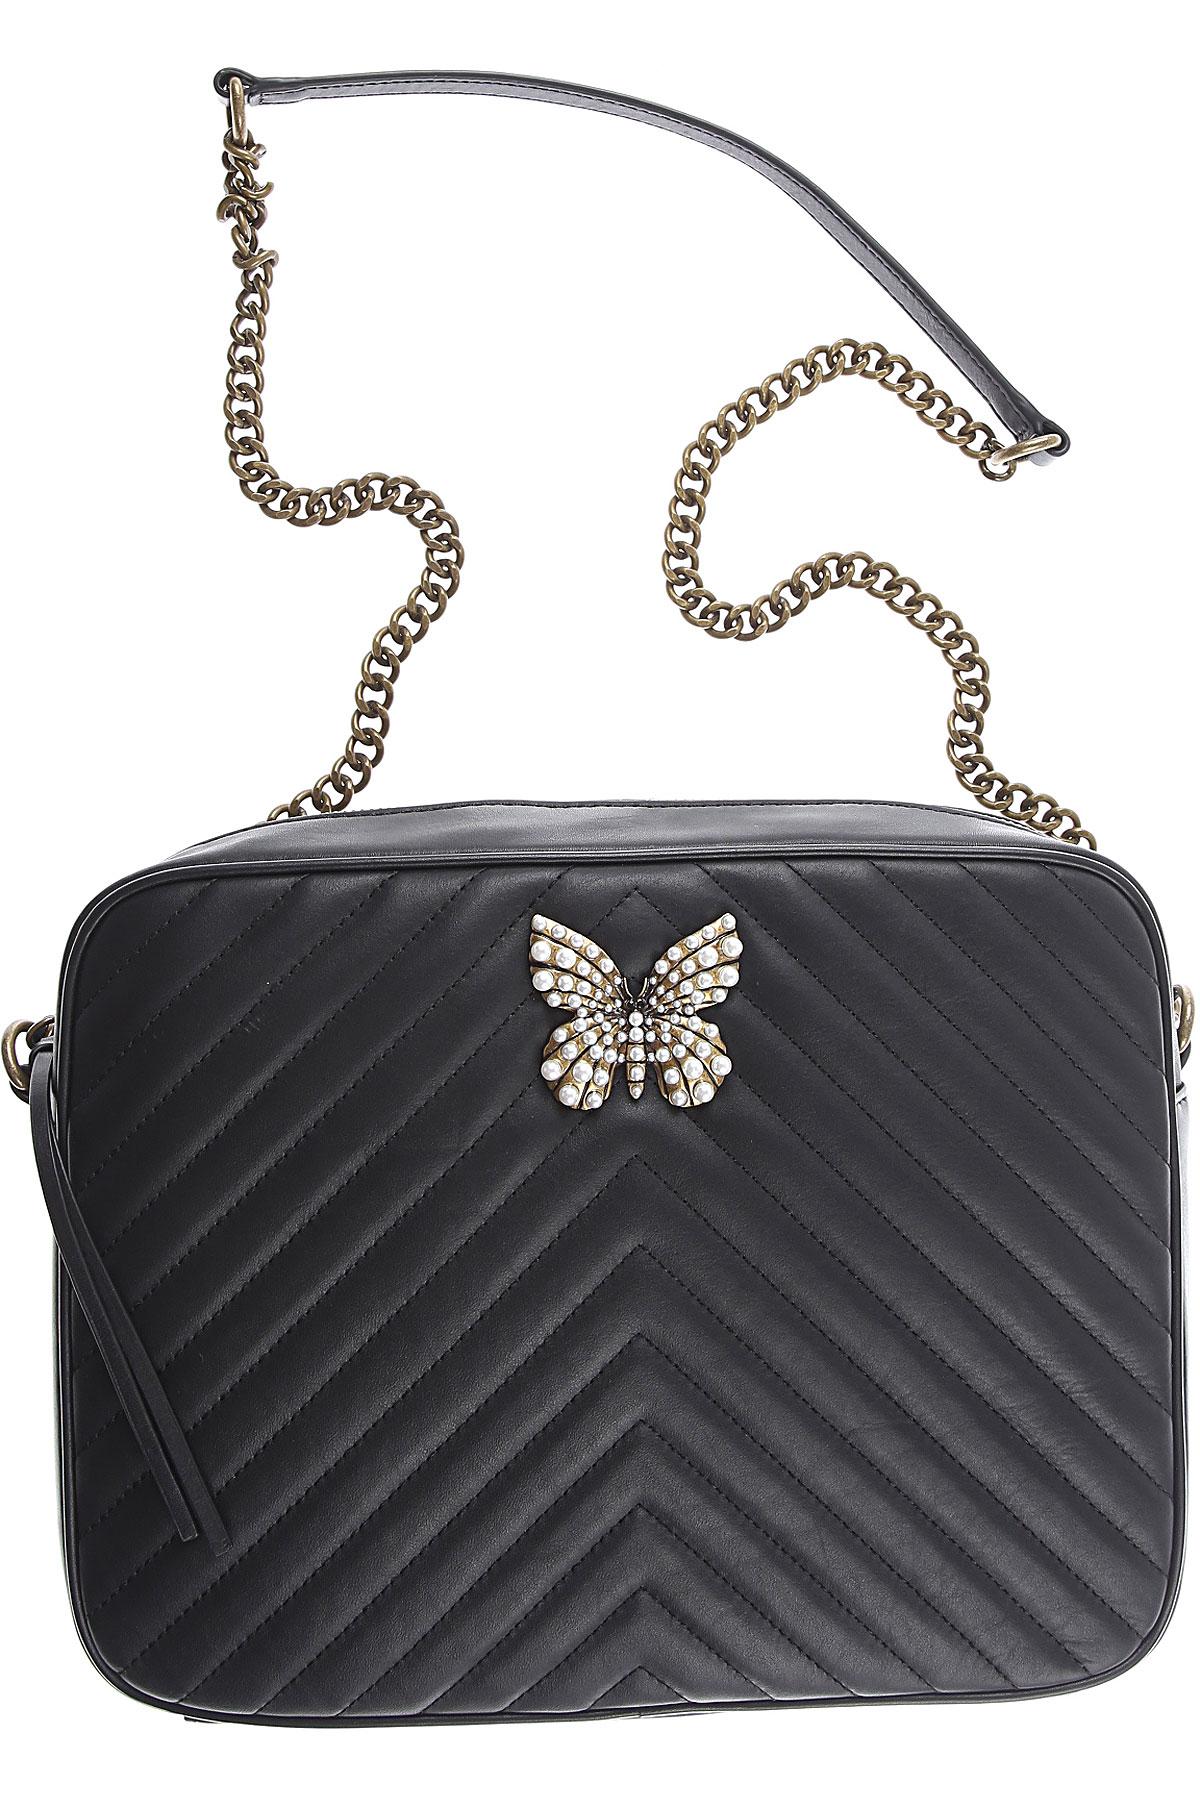 official photos 9238f ab419 Handbags Twin Set by Simona Barbieri, Style code: t0810d ...